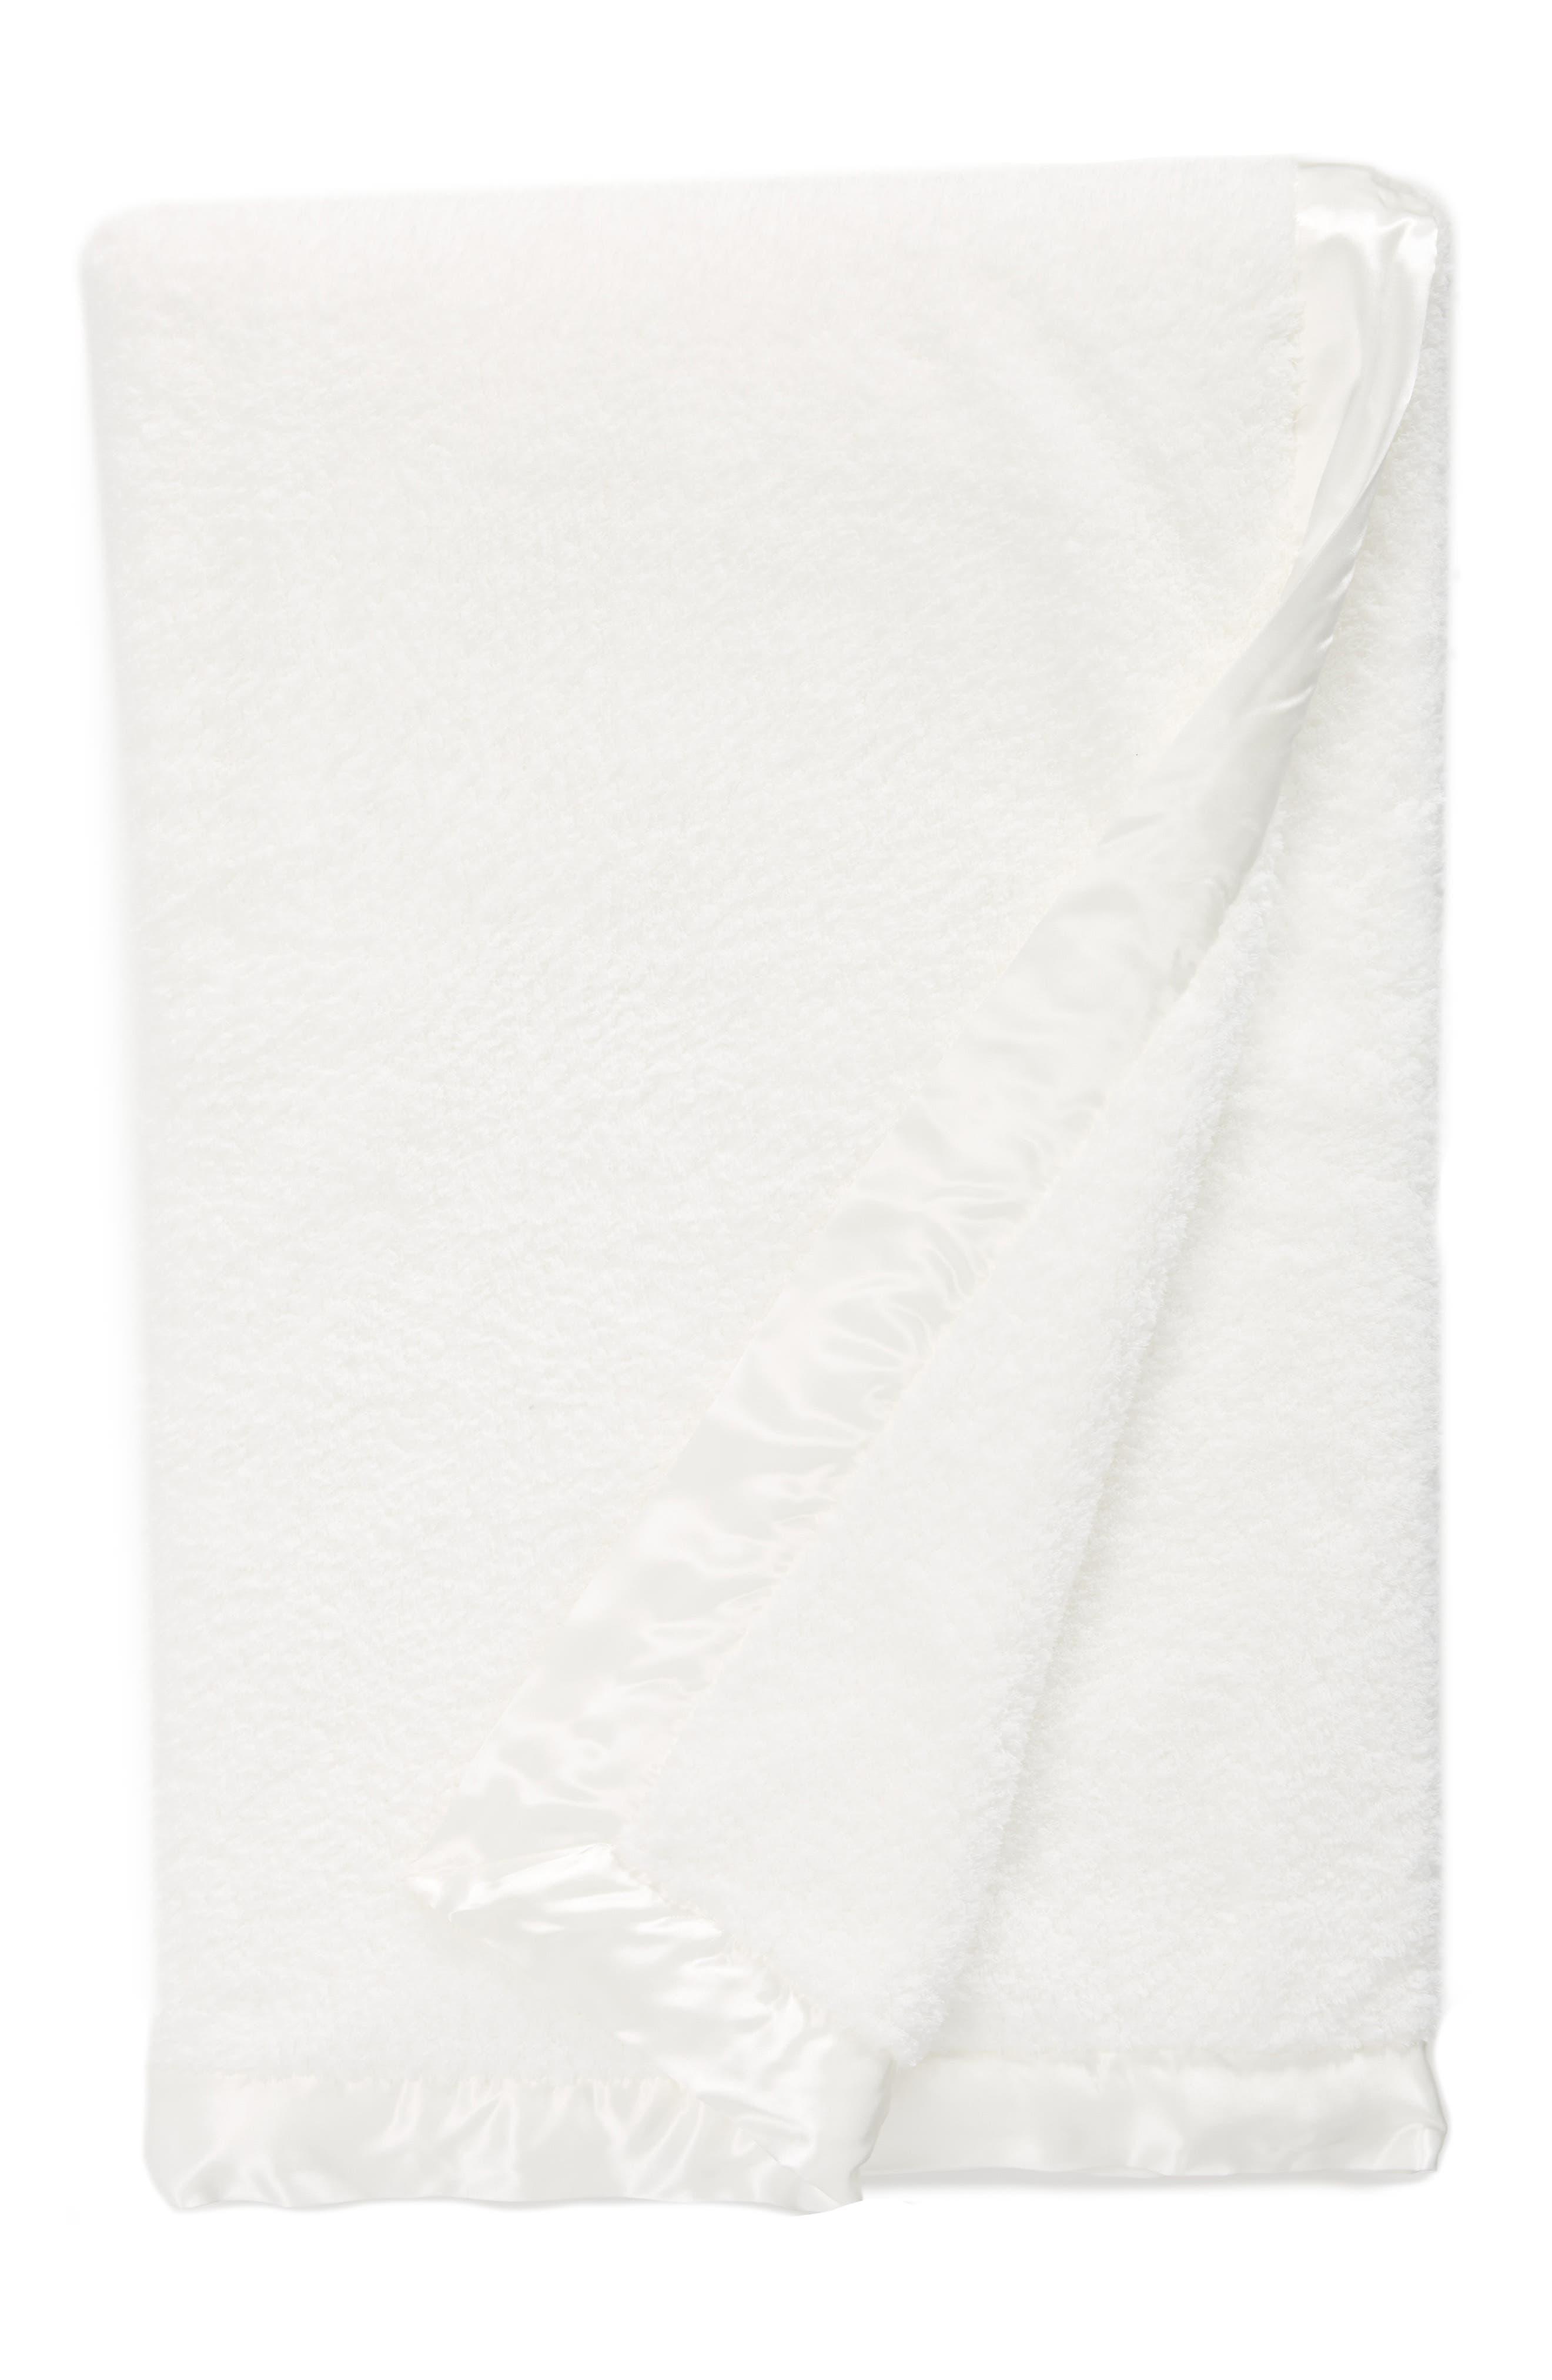 Chenille Throw,                             Main thumbnail 1, color,                             White